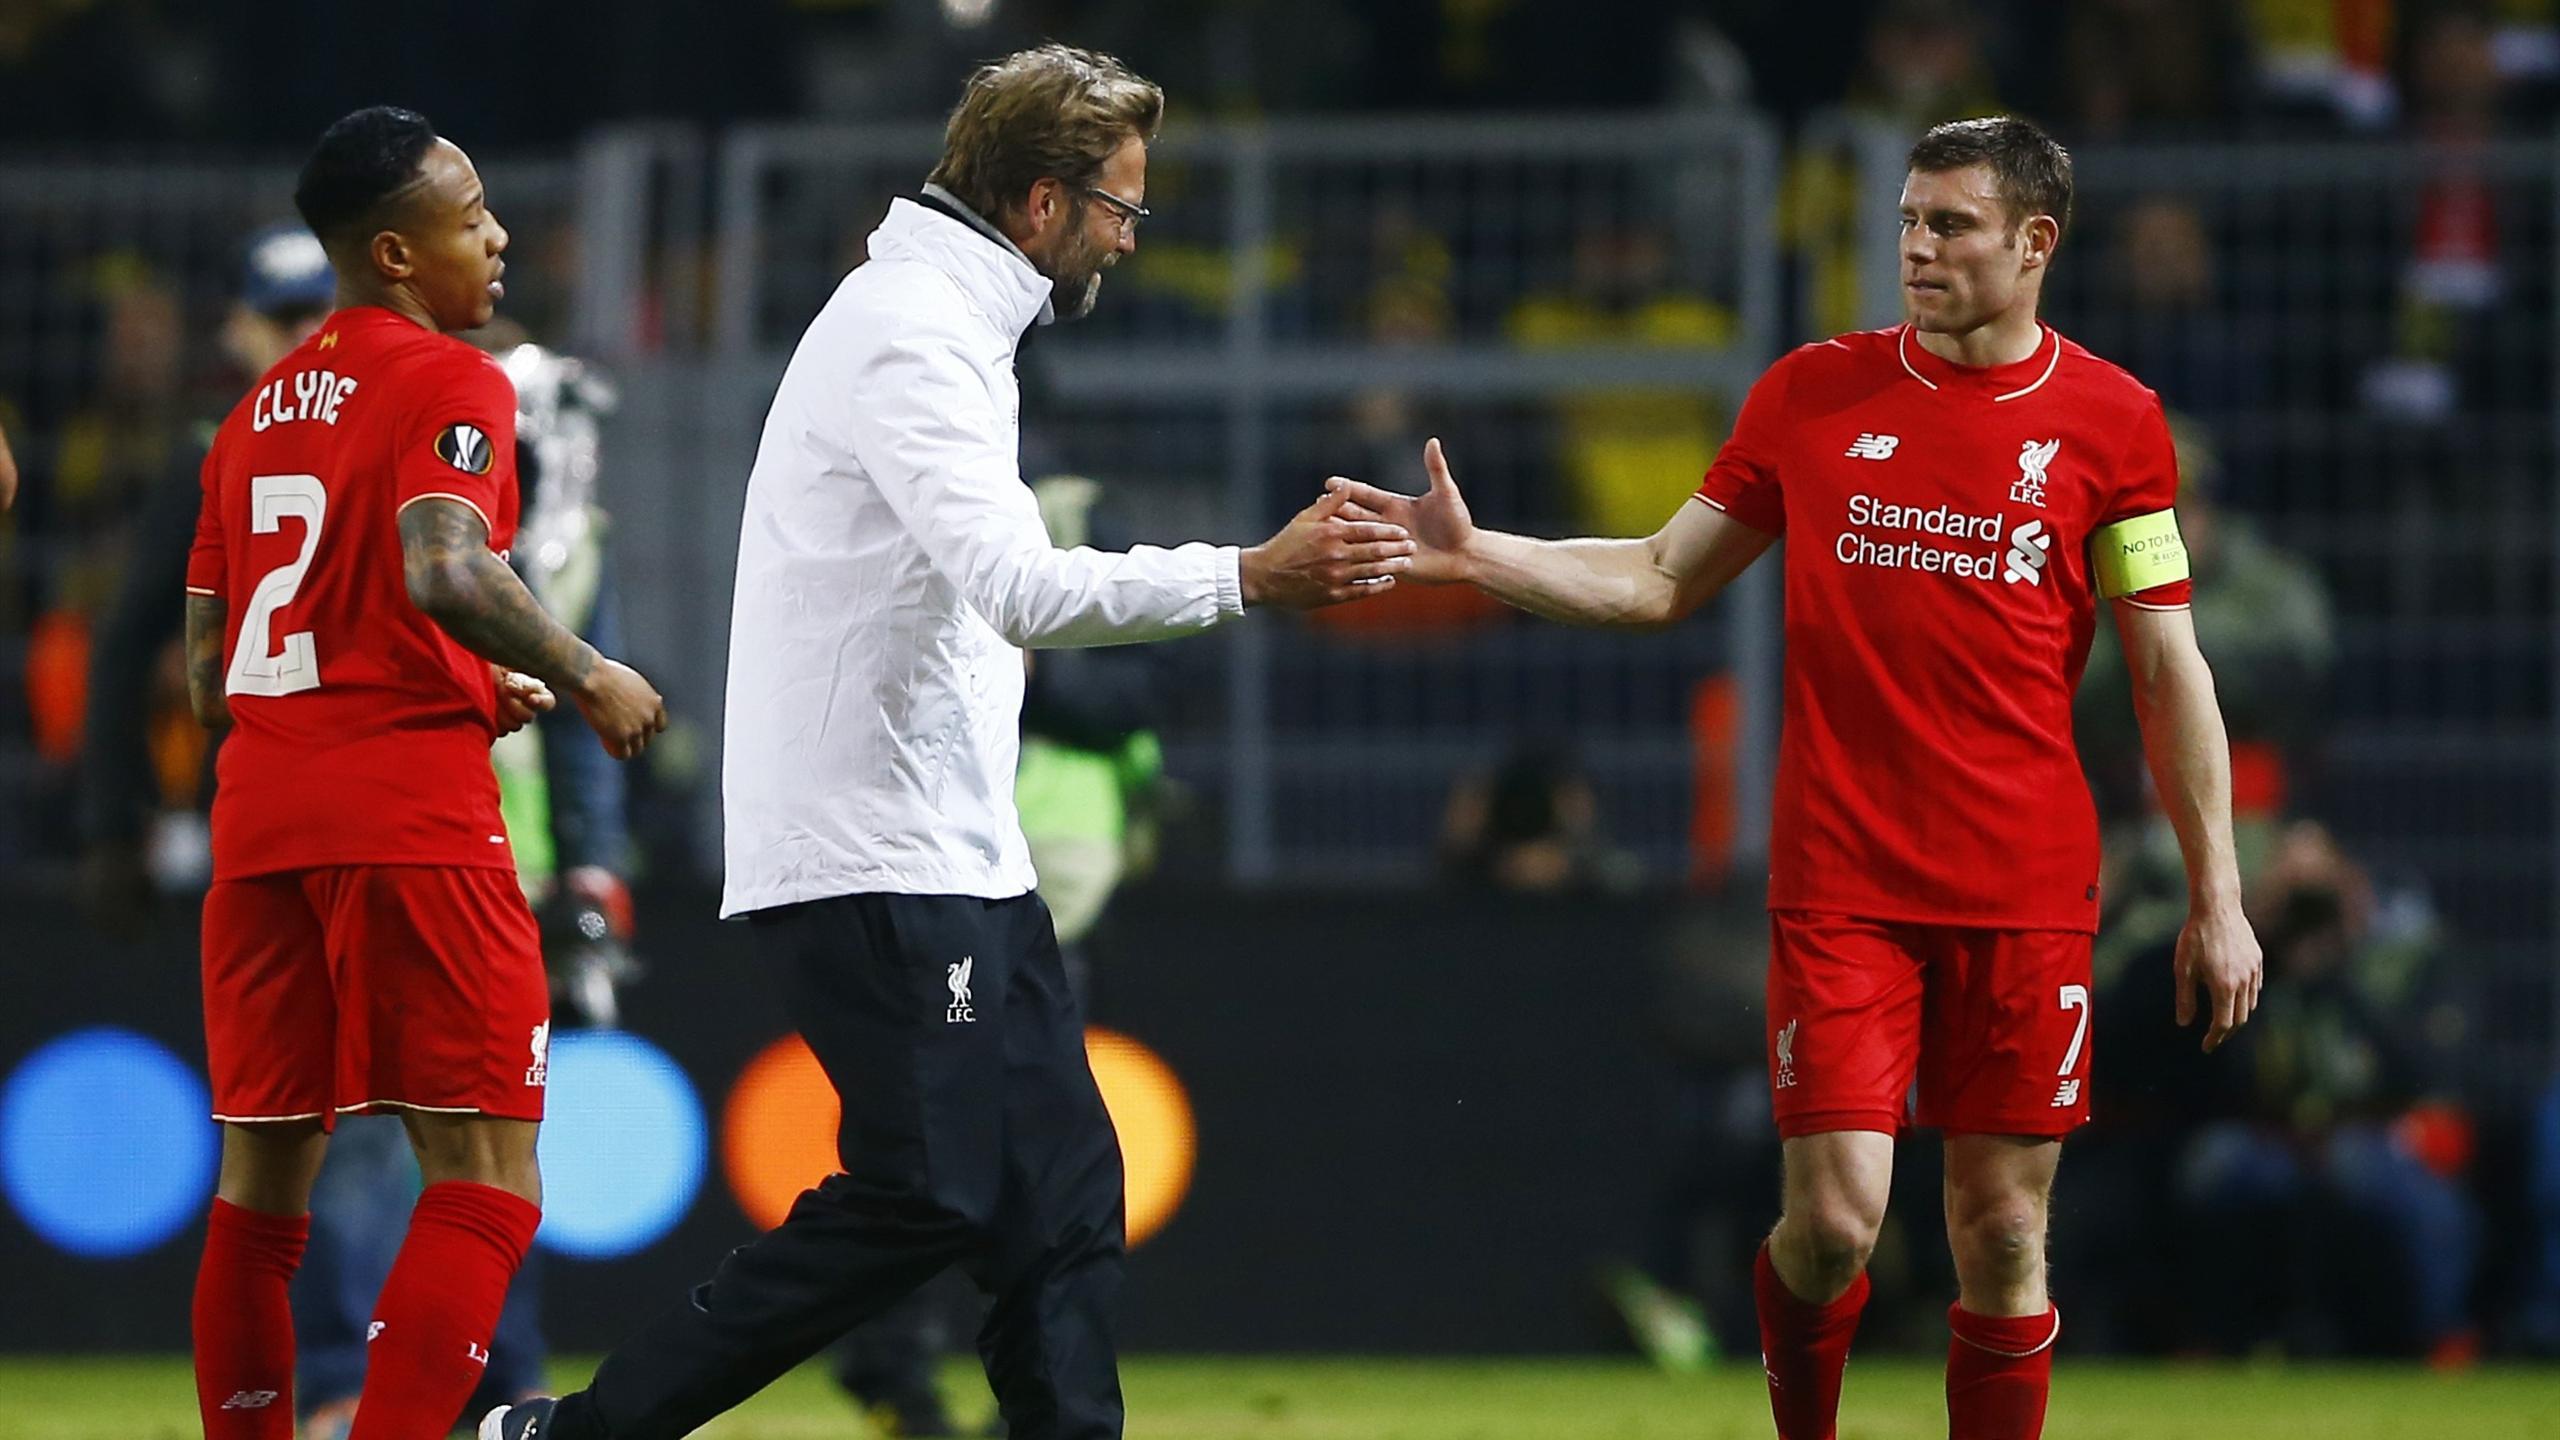 Liverpool manager Jurgen Klopp celebrates with James Milner after the game